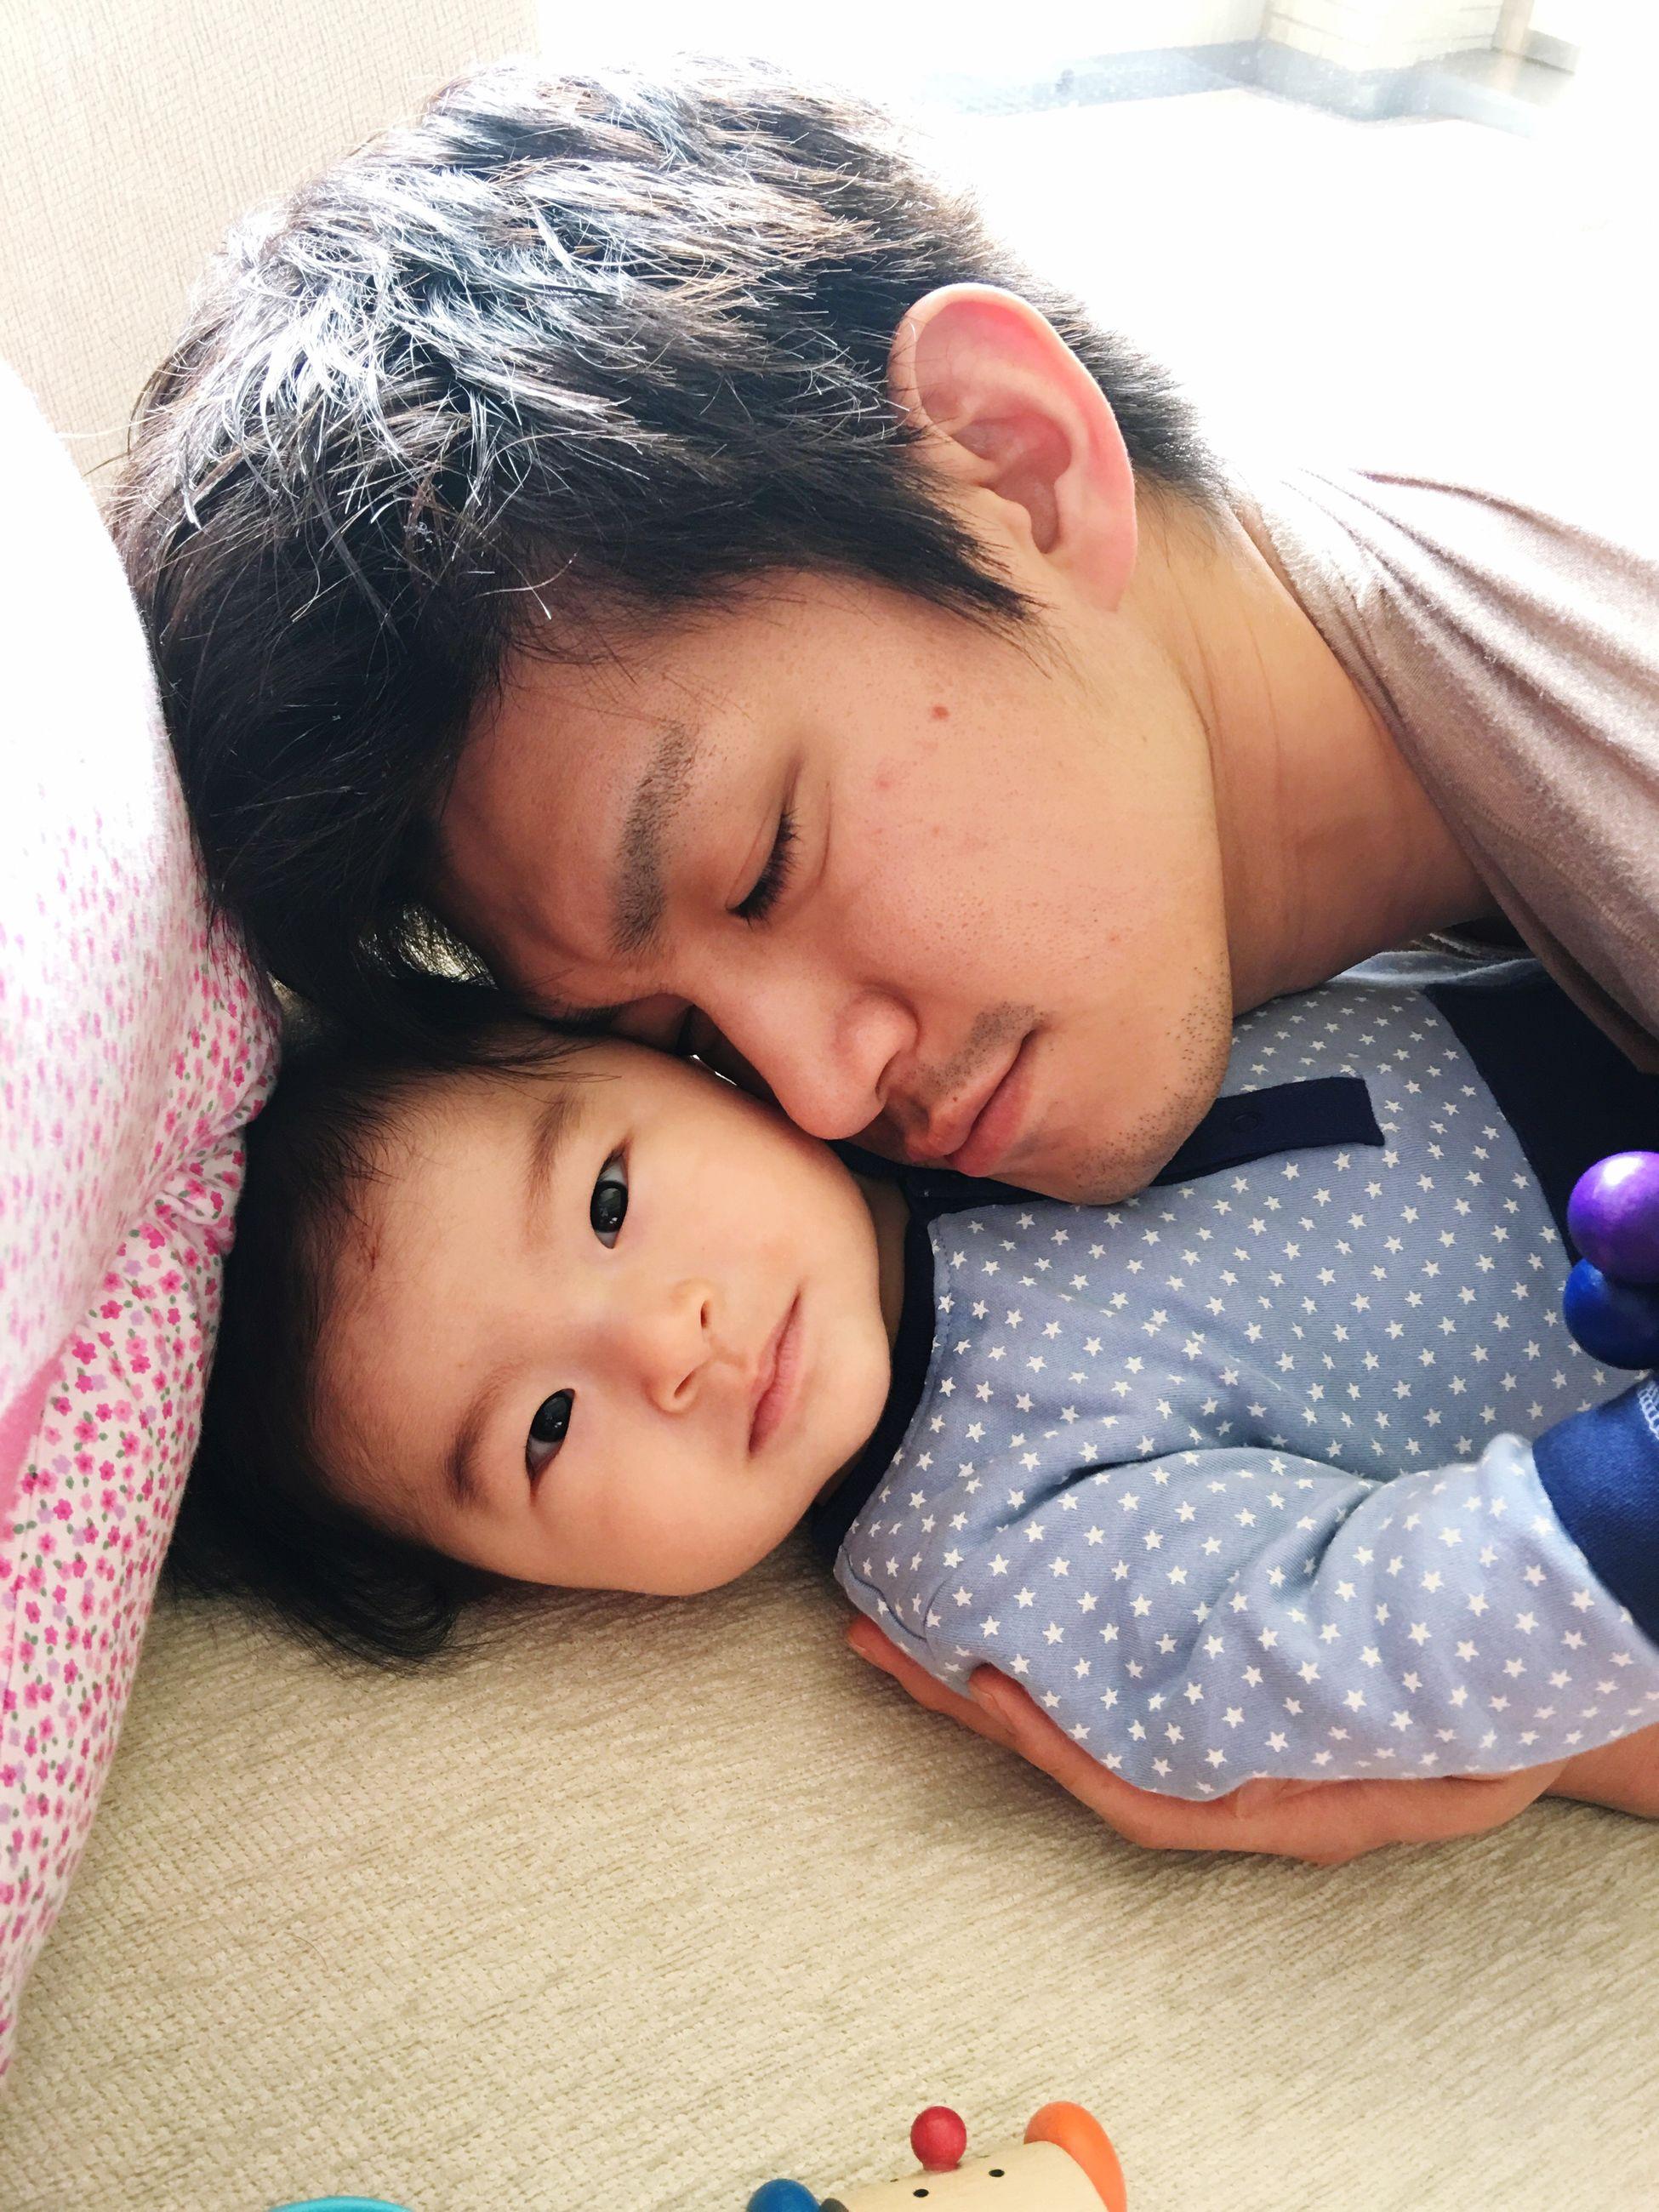 Father & Son Love Baby Innocence Bonding Babyhood Indoors  Family Myfavoritephoto Mysweetbabies Treasure